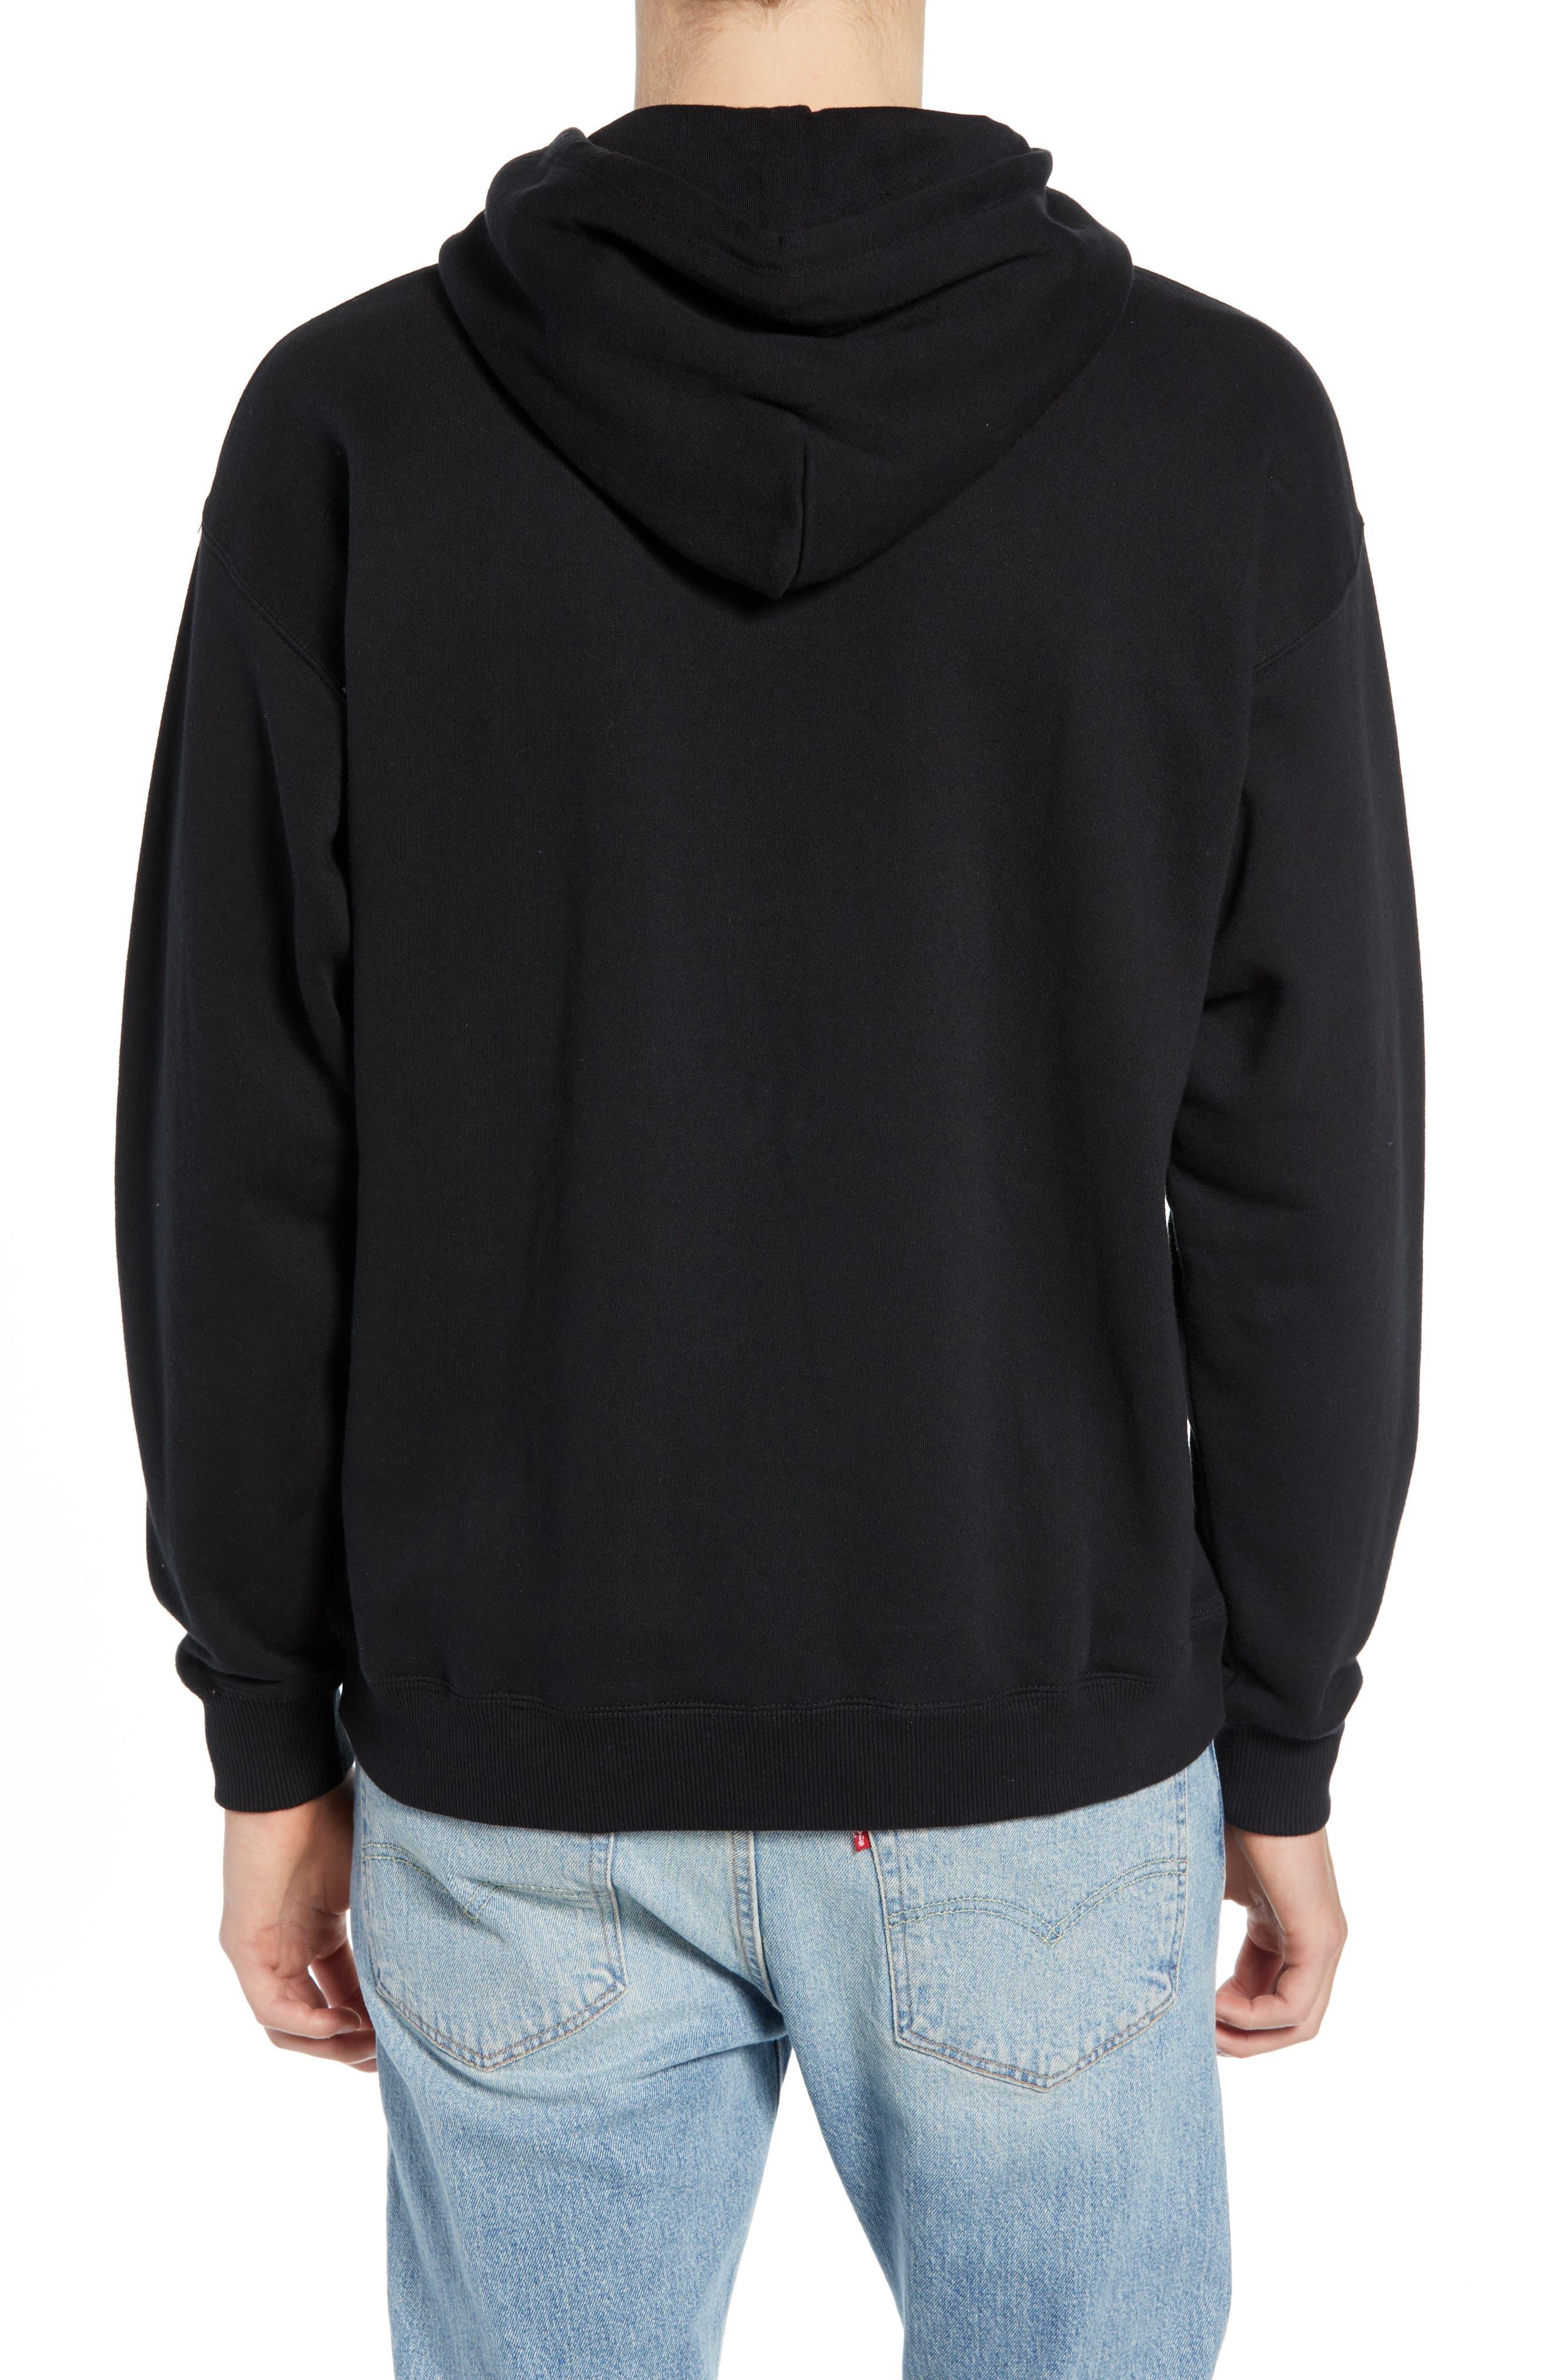 B-Shield Hooded Sweatshirt,                             Alternate thumbnail 2, color,                             001